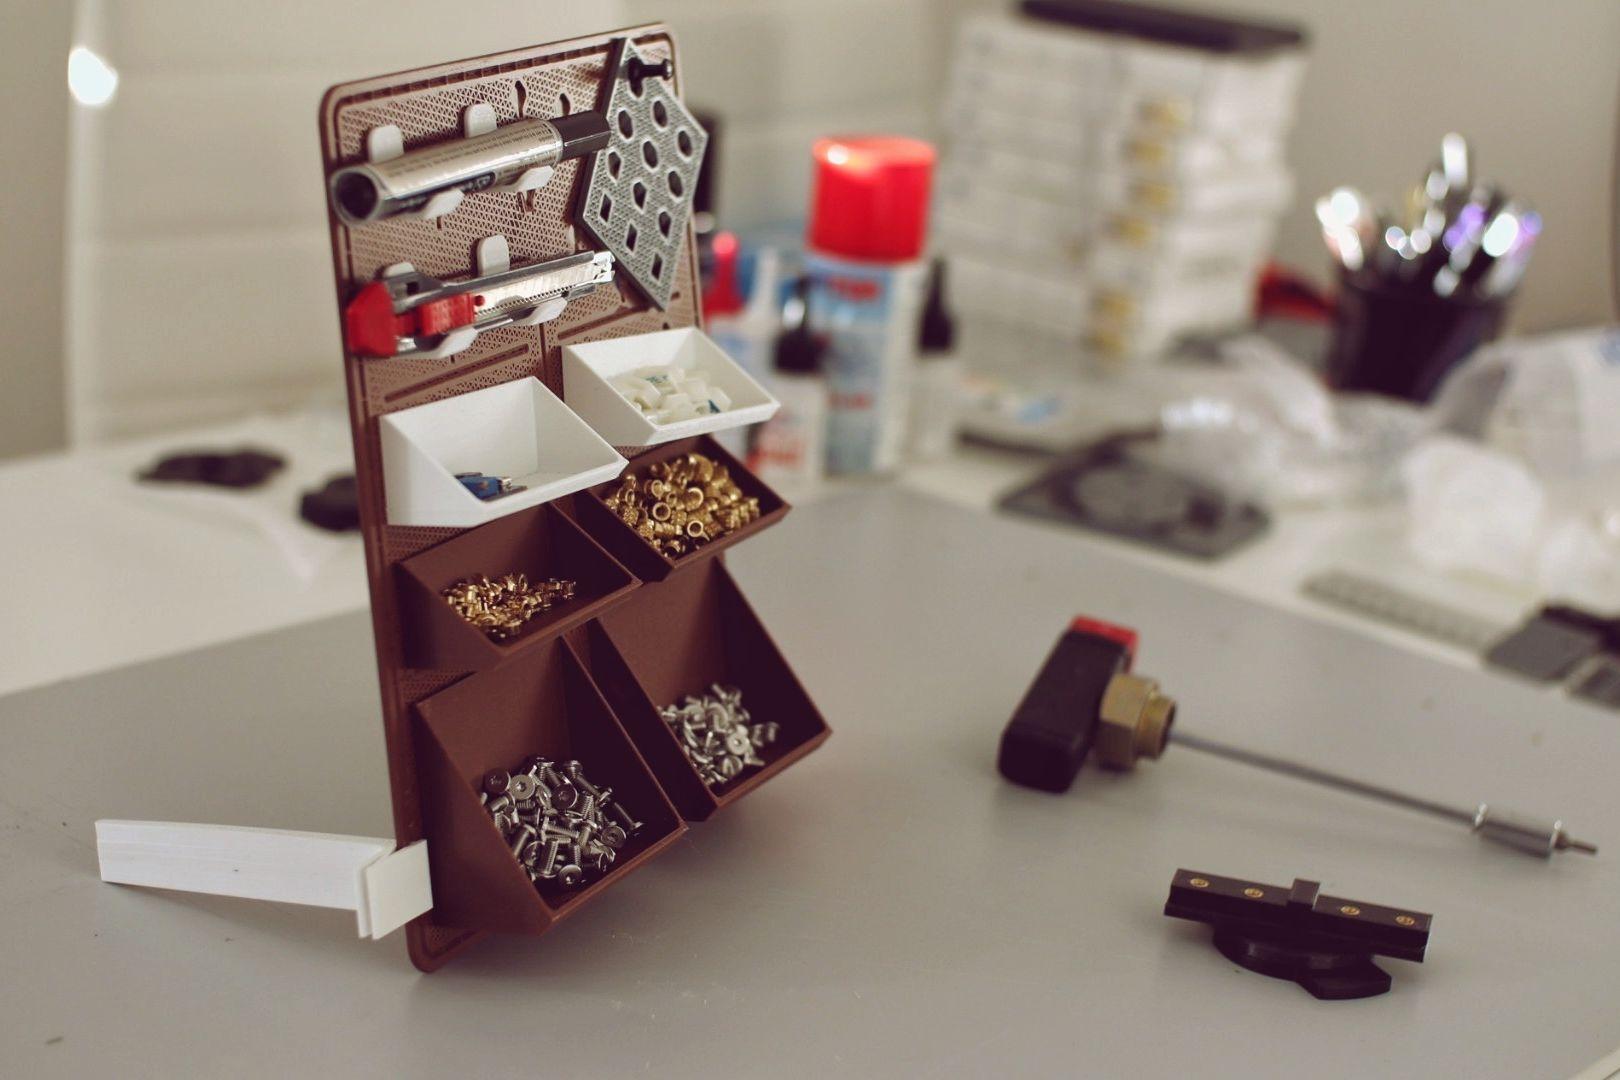 https://cults3d.com/en/3d-model/tool/sixpack-modular-bulletin-organizer